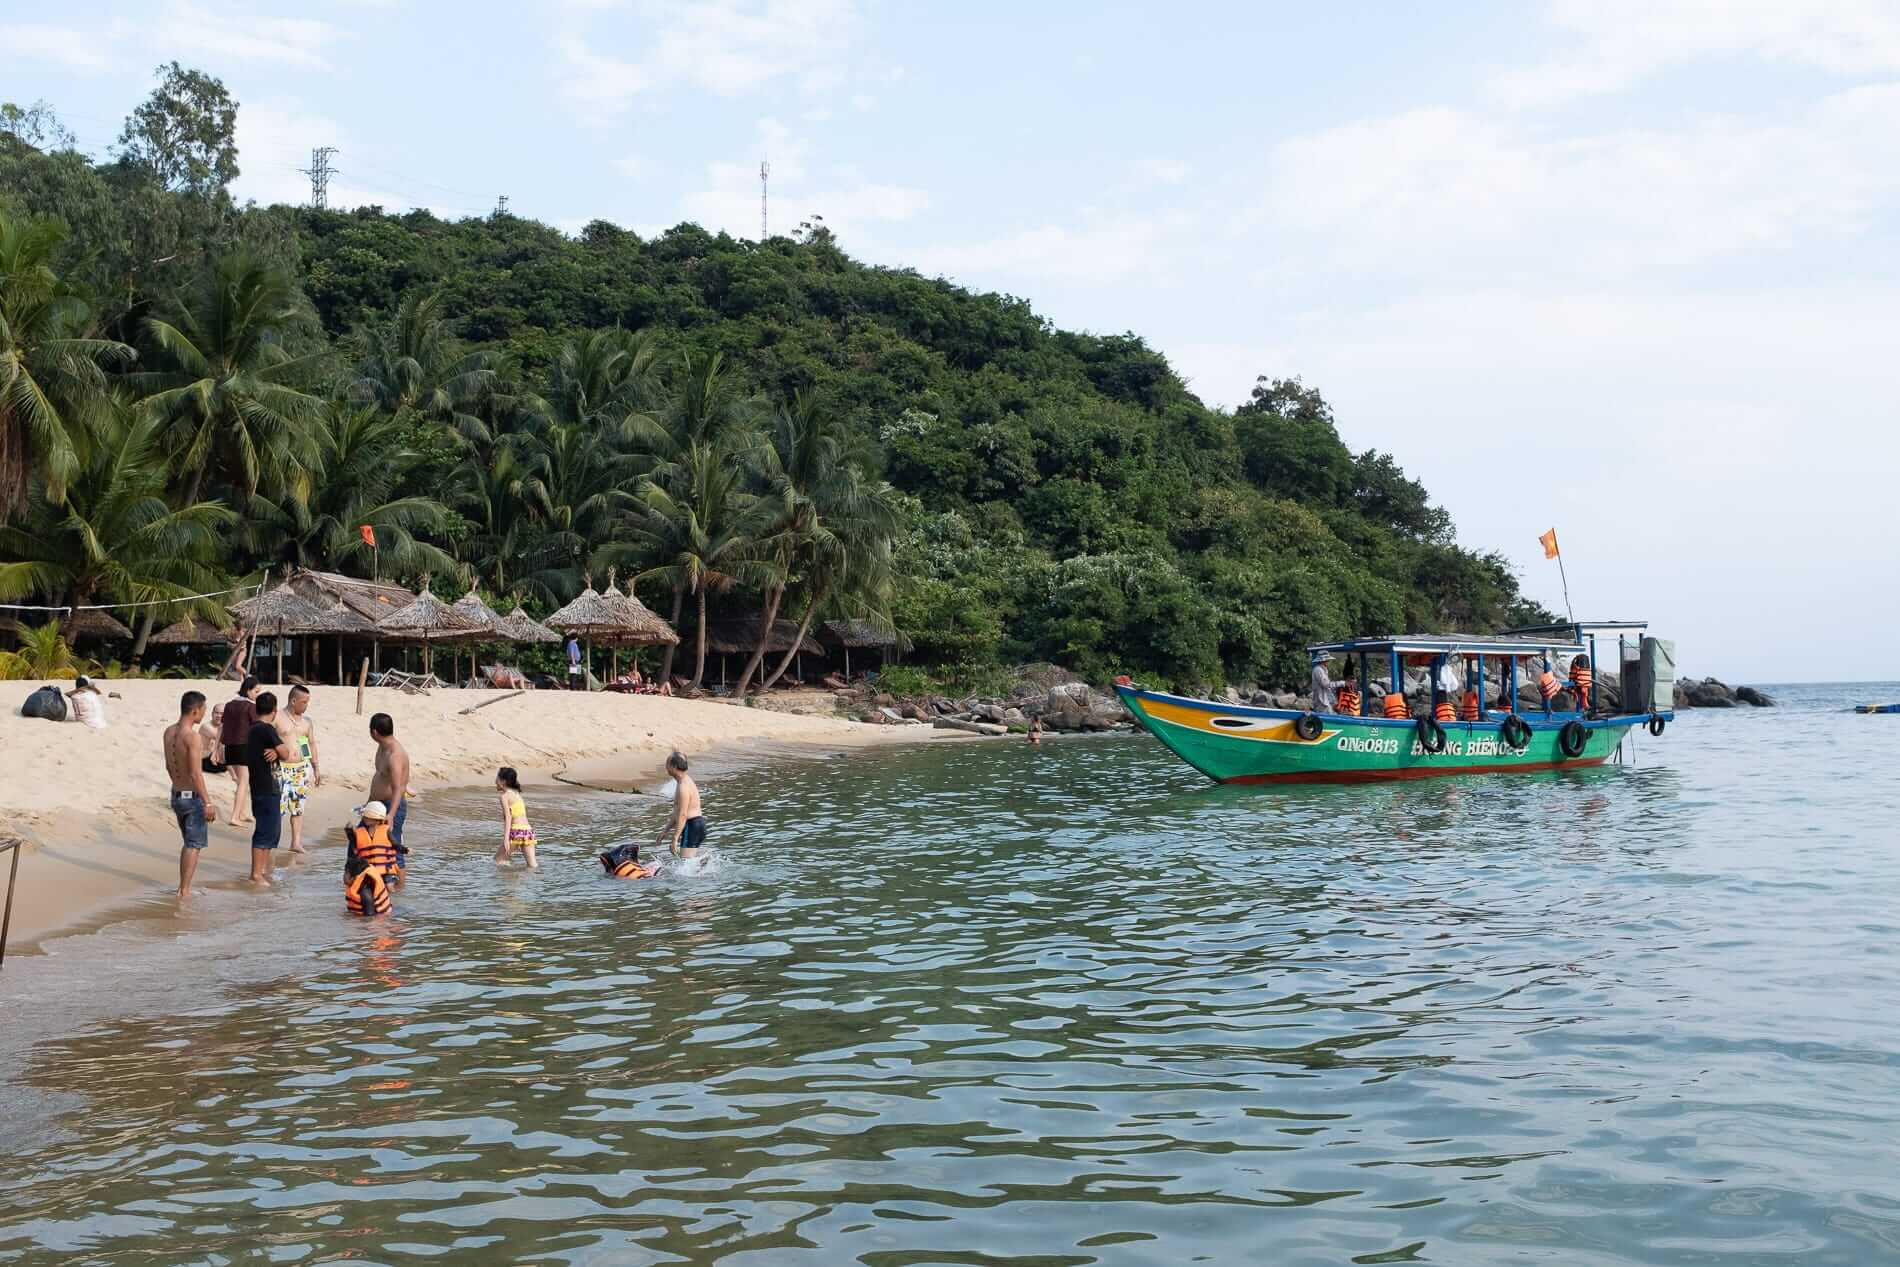 Family enjoying the beach at Cham Islands